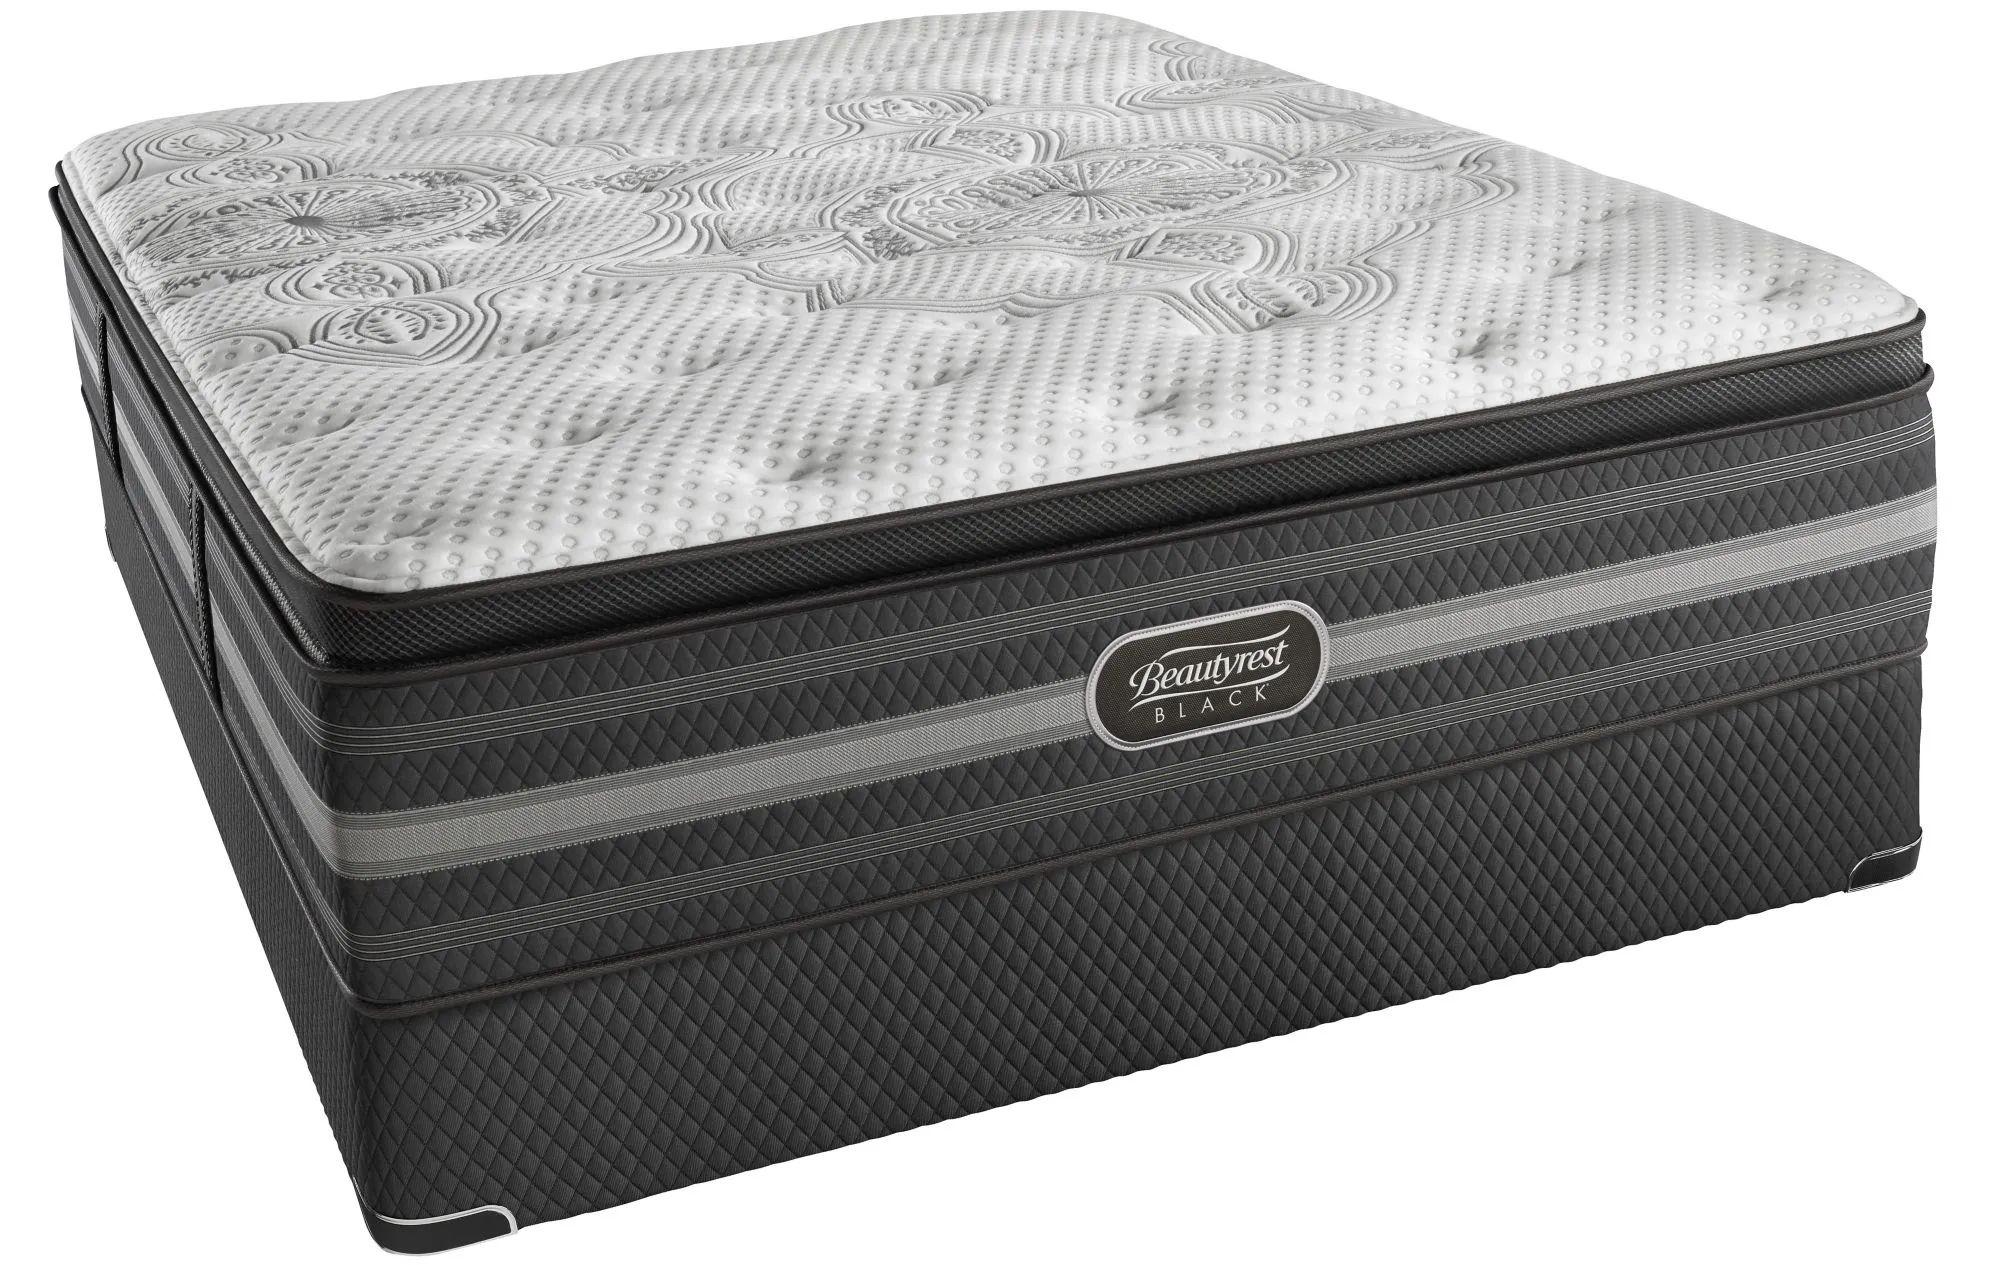 king simmons beautyrest black katarina plush pillow top 15 inch mattress free 300 visa gift card